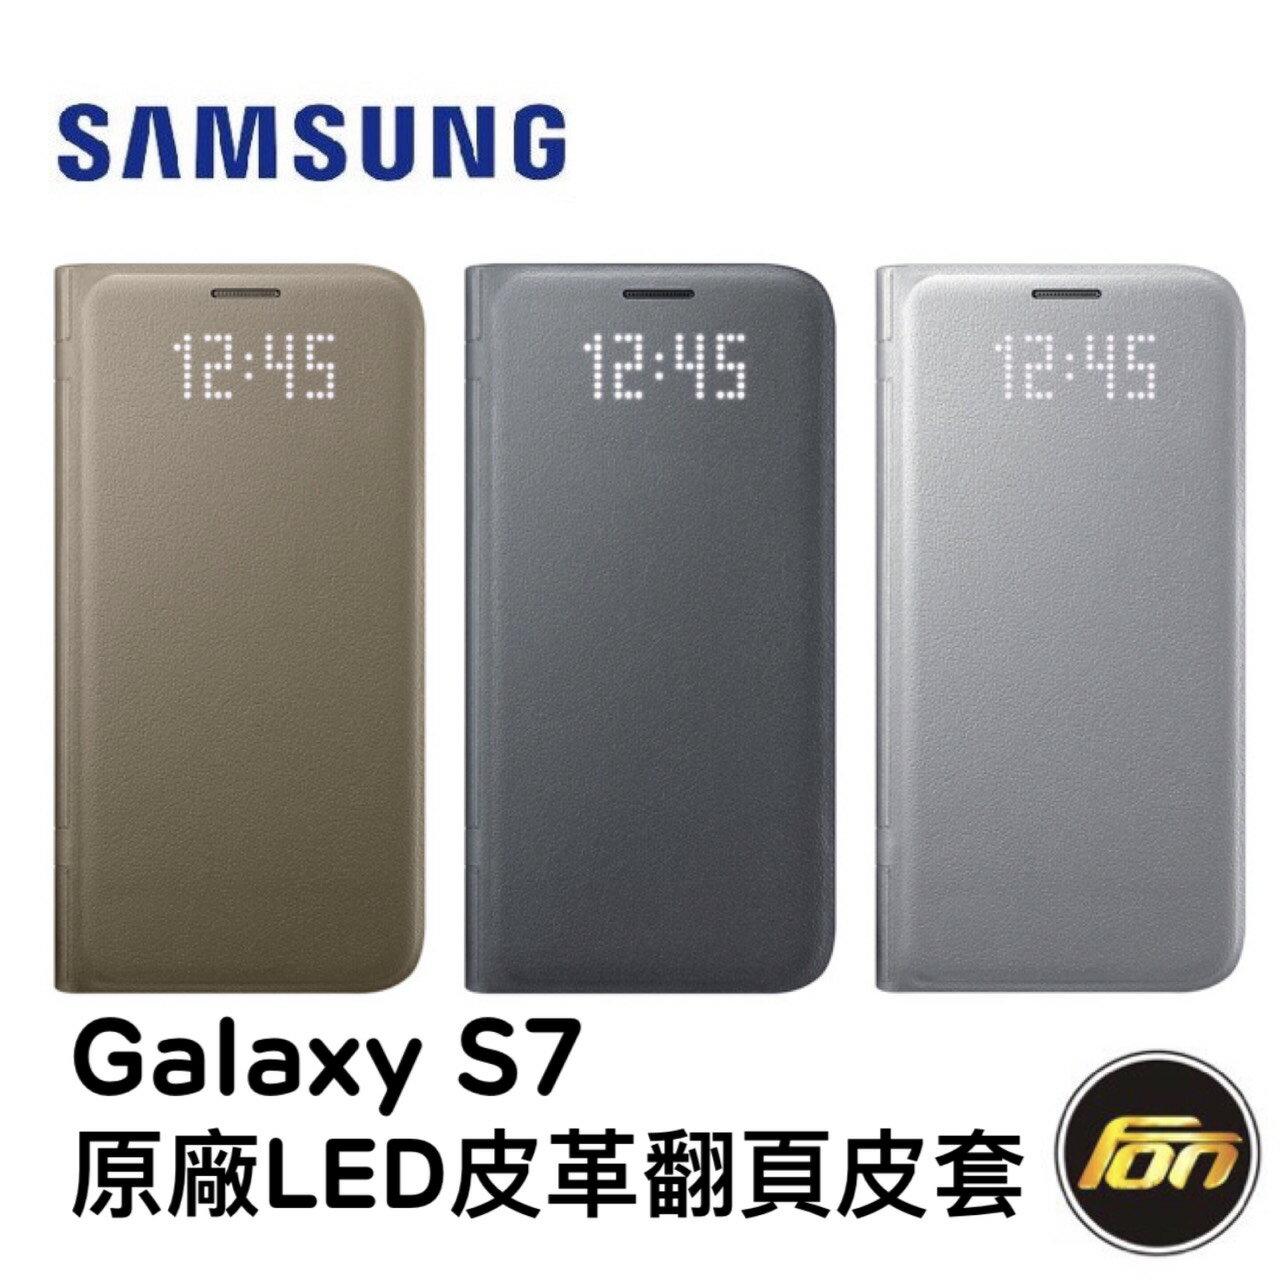 SAMSUNG Galaxy S7 原廠 LED皮革 翻頁皮套 保護套